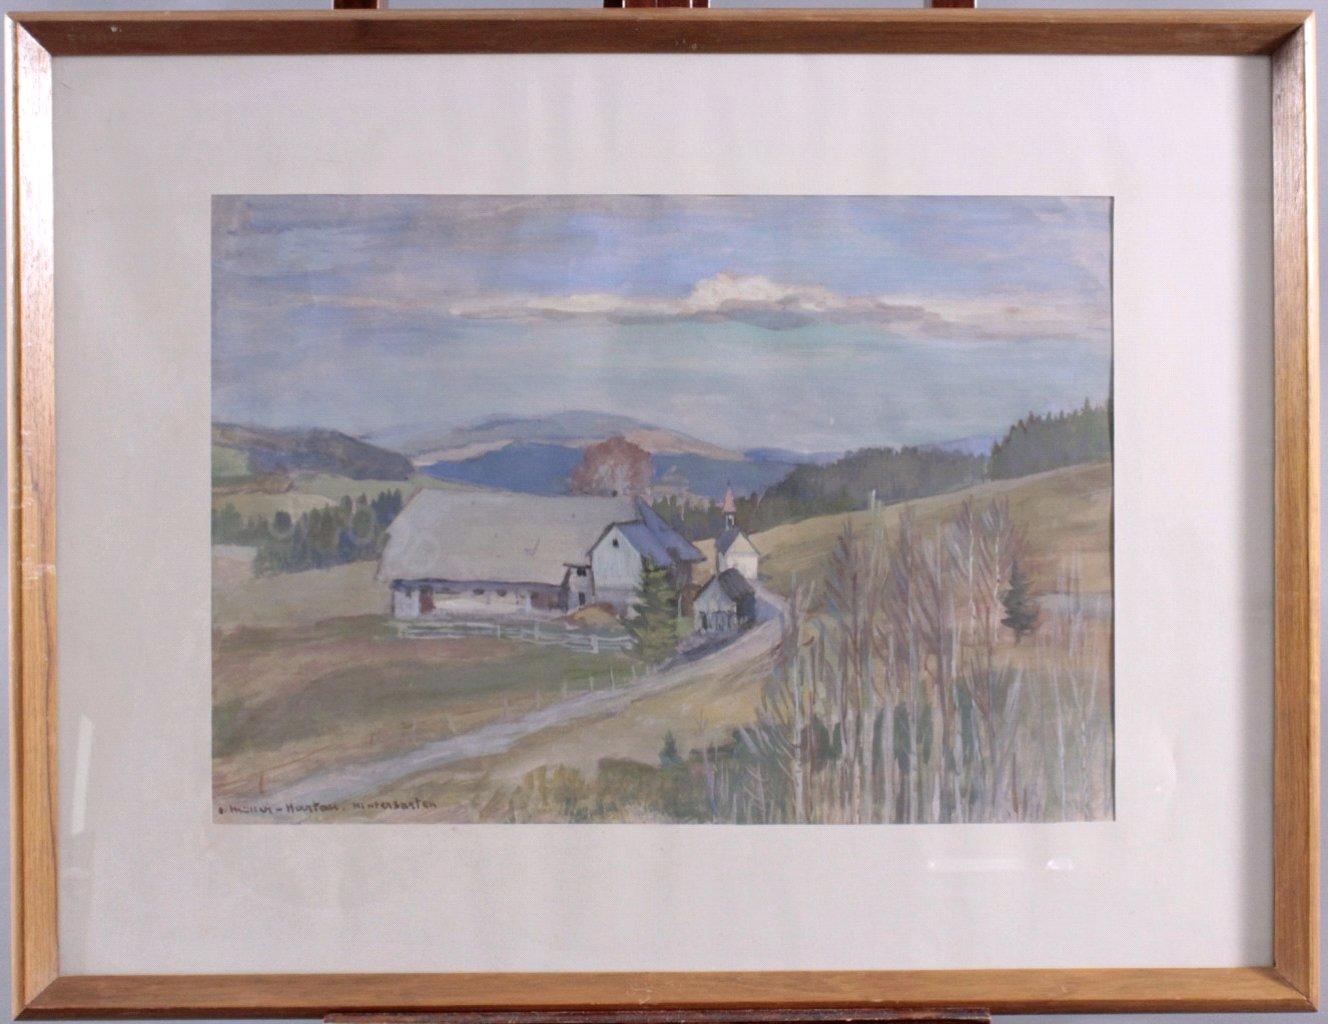 Otto Müller-Hartau (1898-1969)